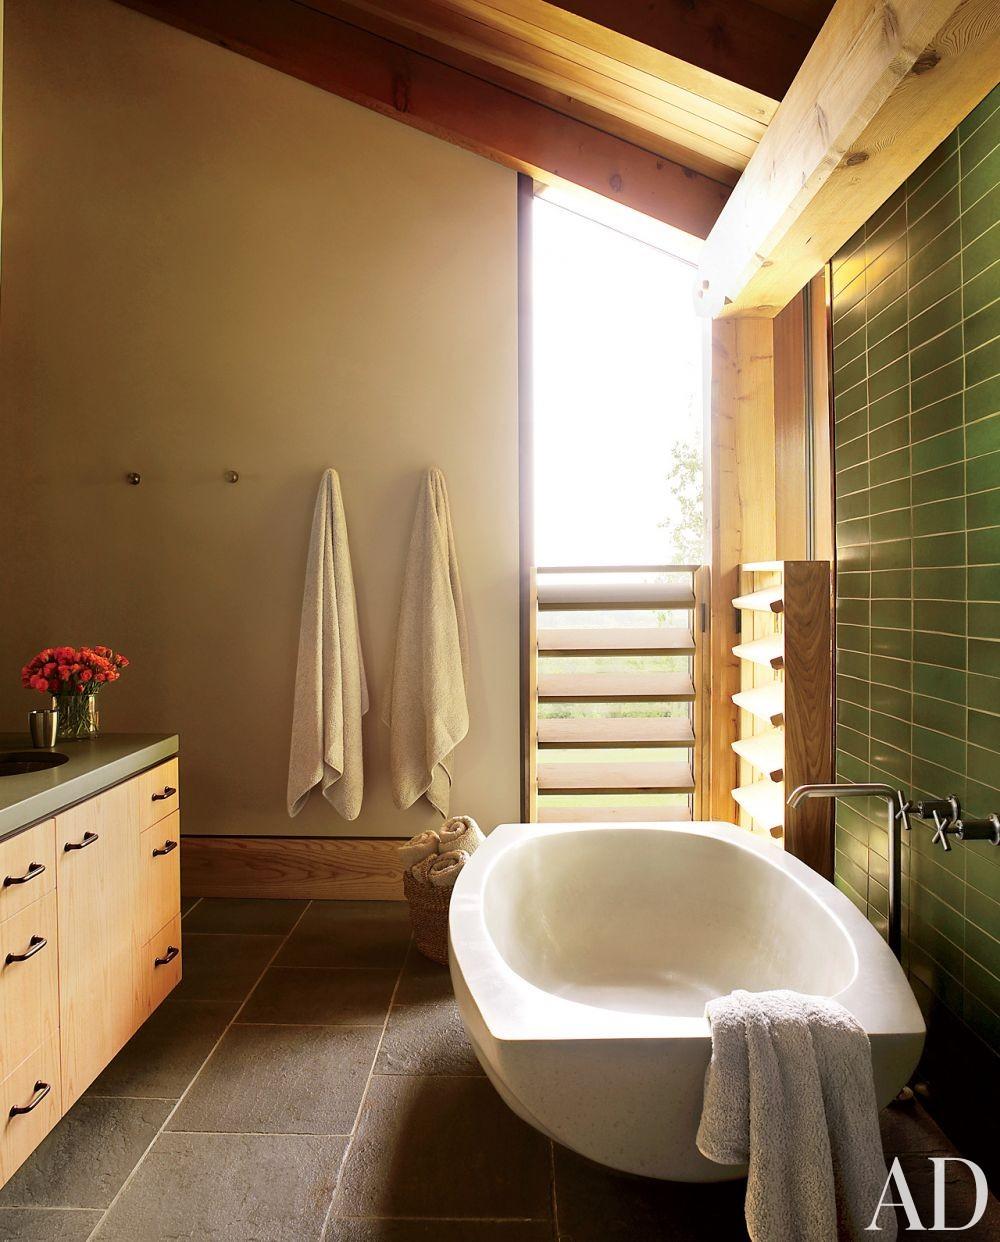 Contemporary Bathroom by Ike Kligerman Barkley Architects in Hudson Valley, New York